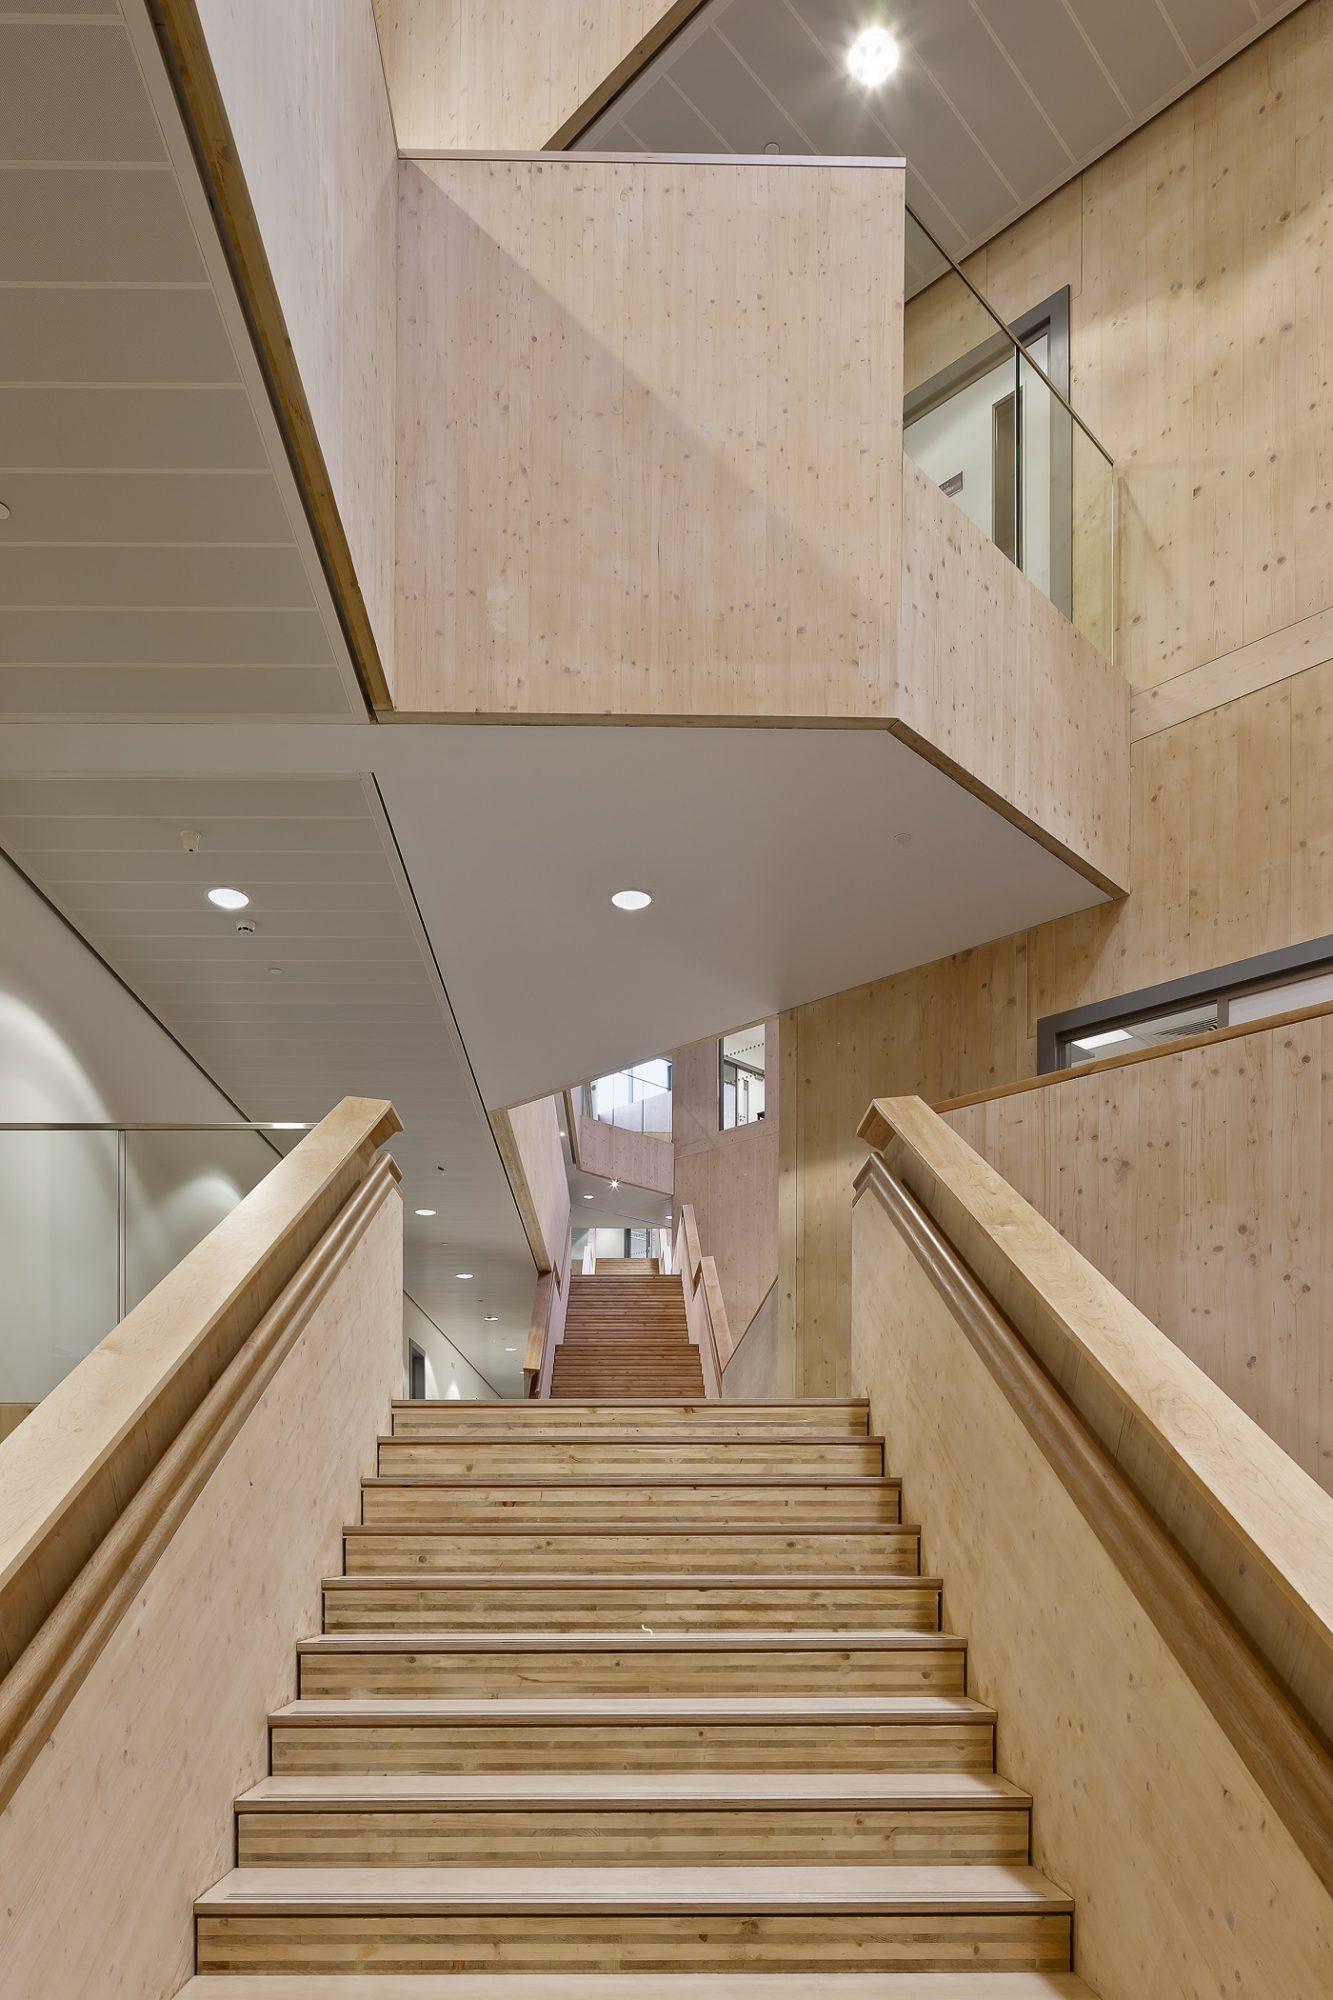 Engineered timber, cross laminated timber,